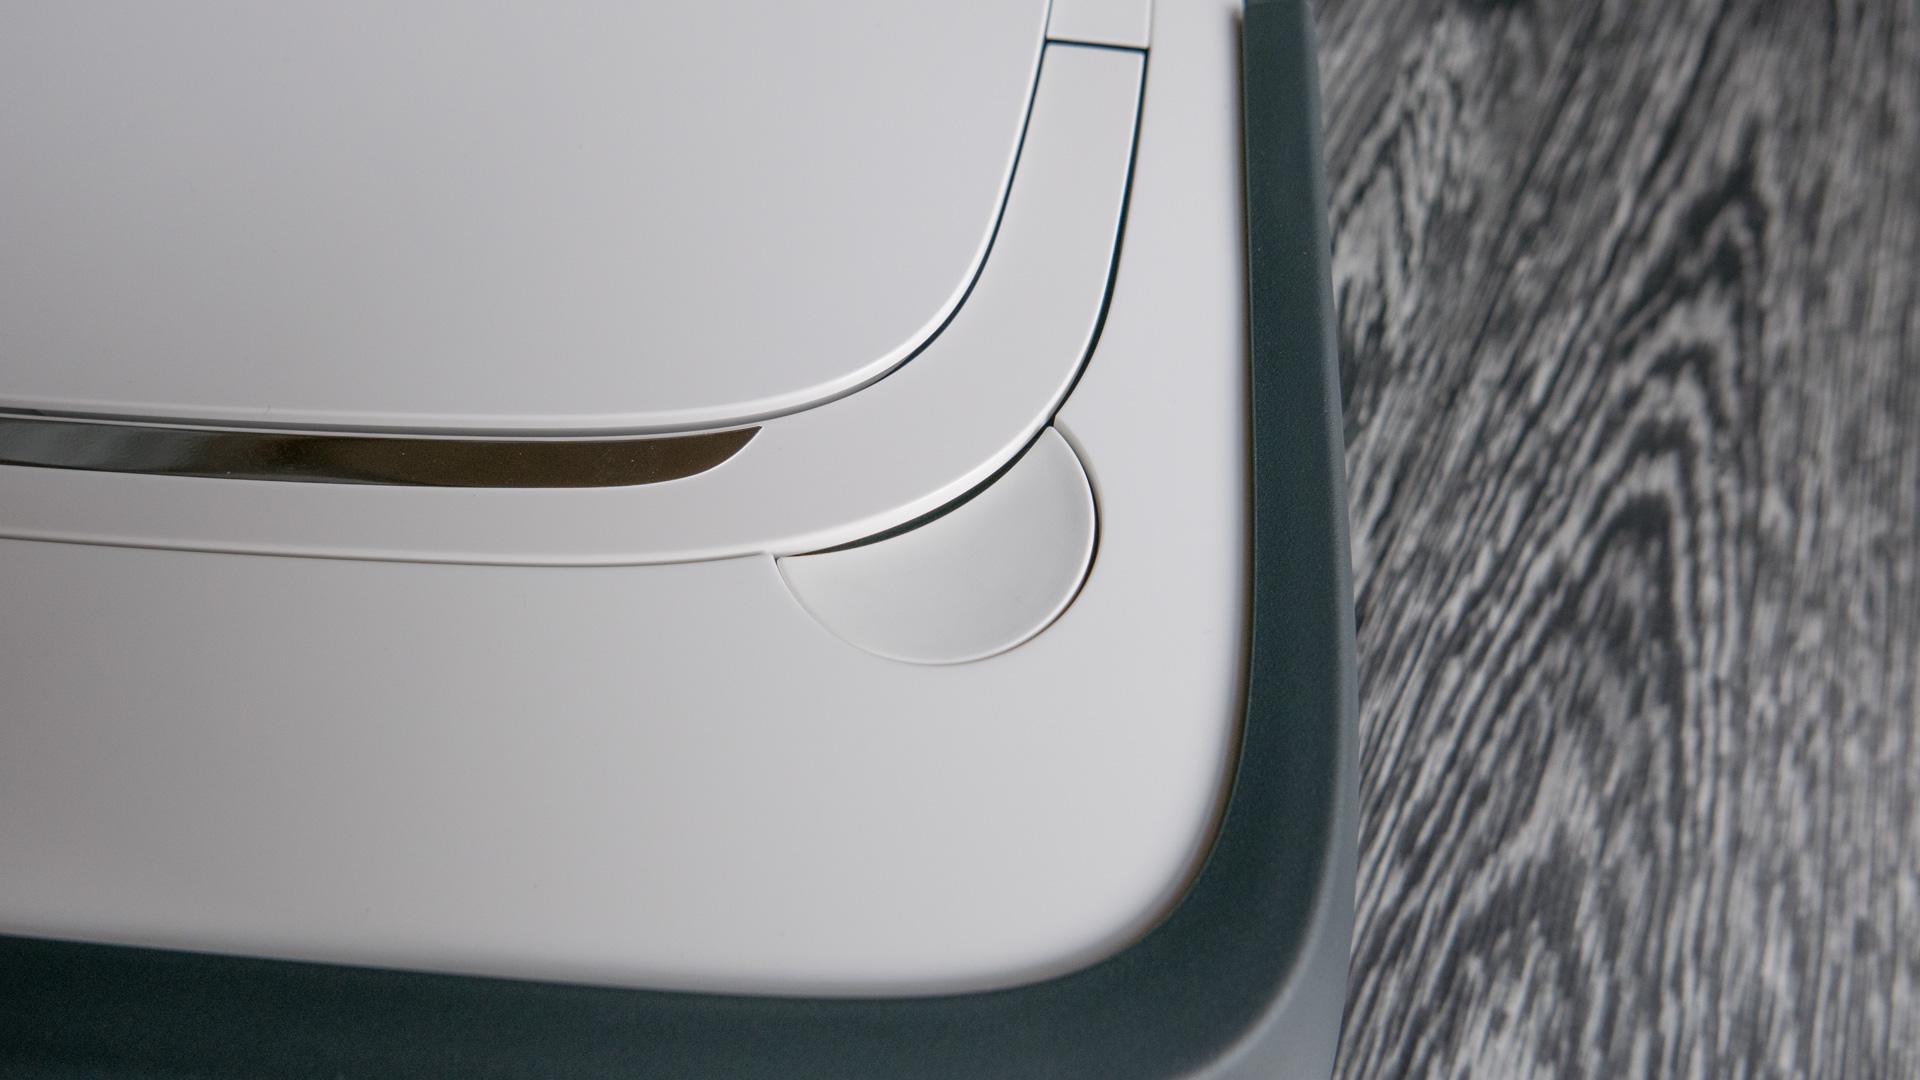 Vorwerk-VR300-Details-15